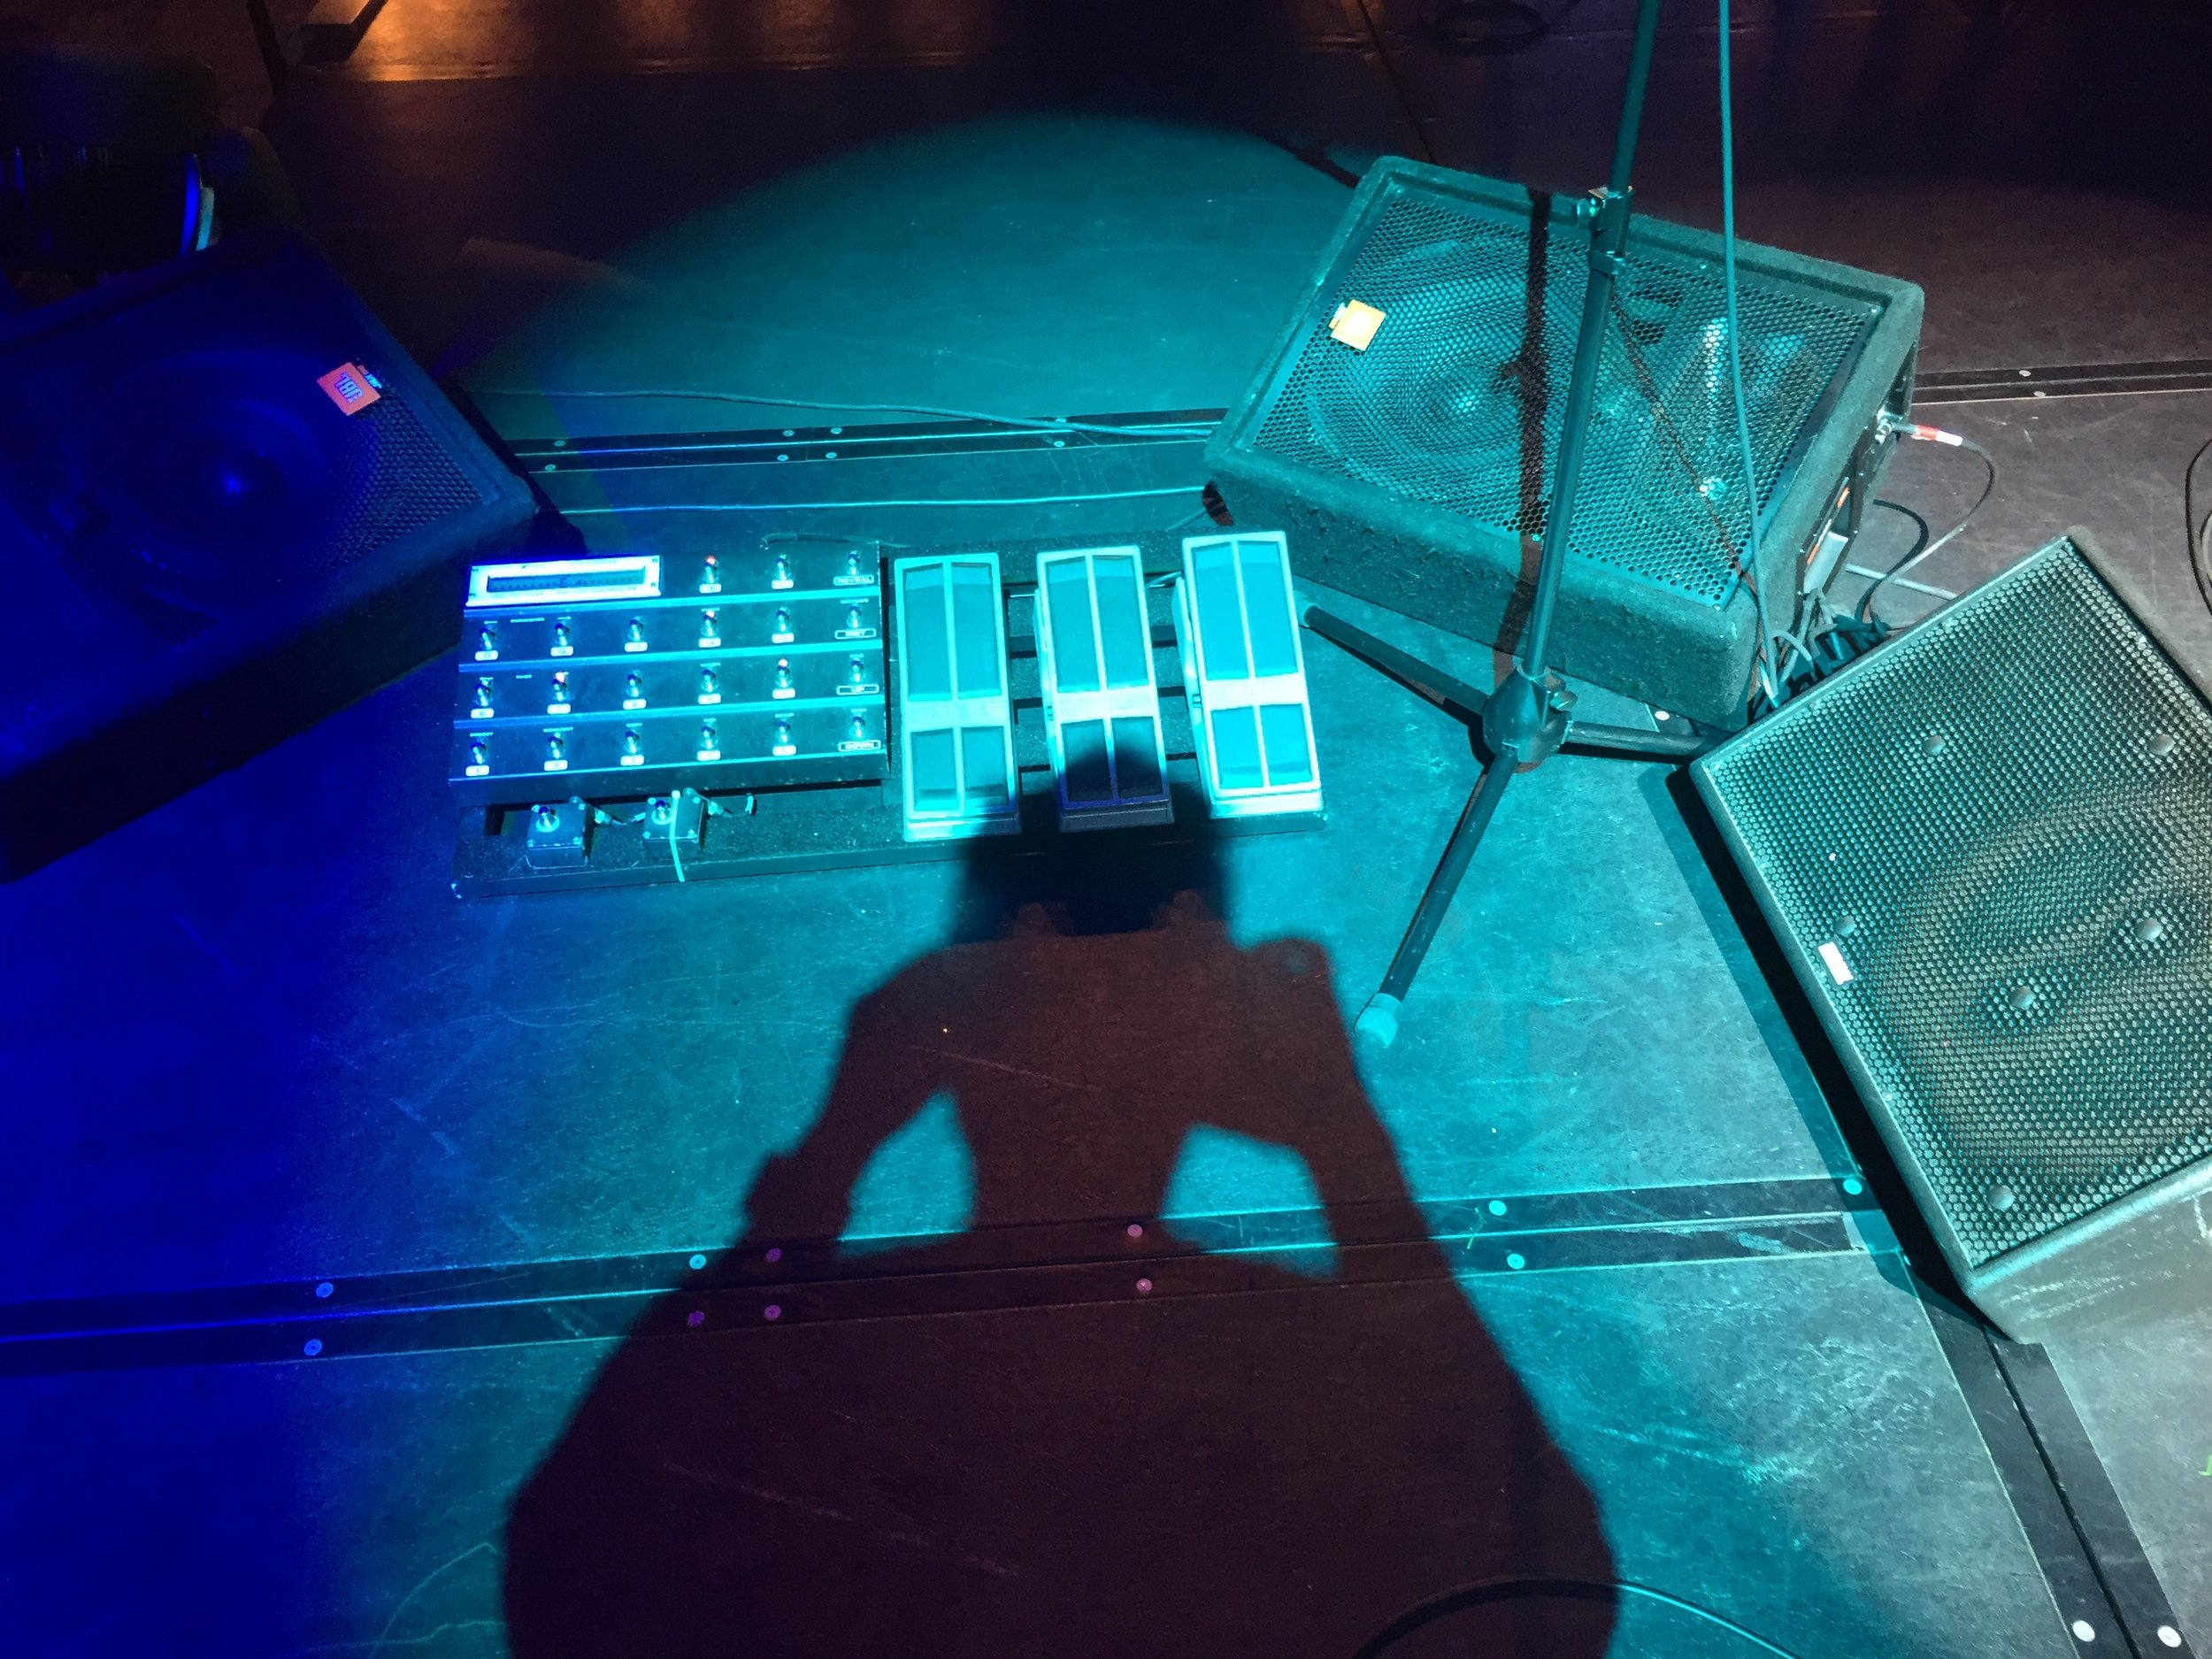 w/Live Band Karaoke at Olivet Nazarene University.